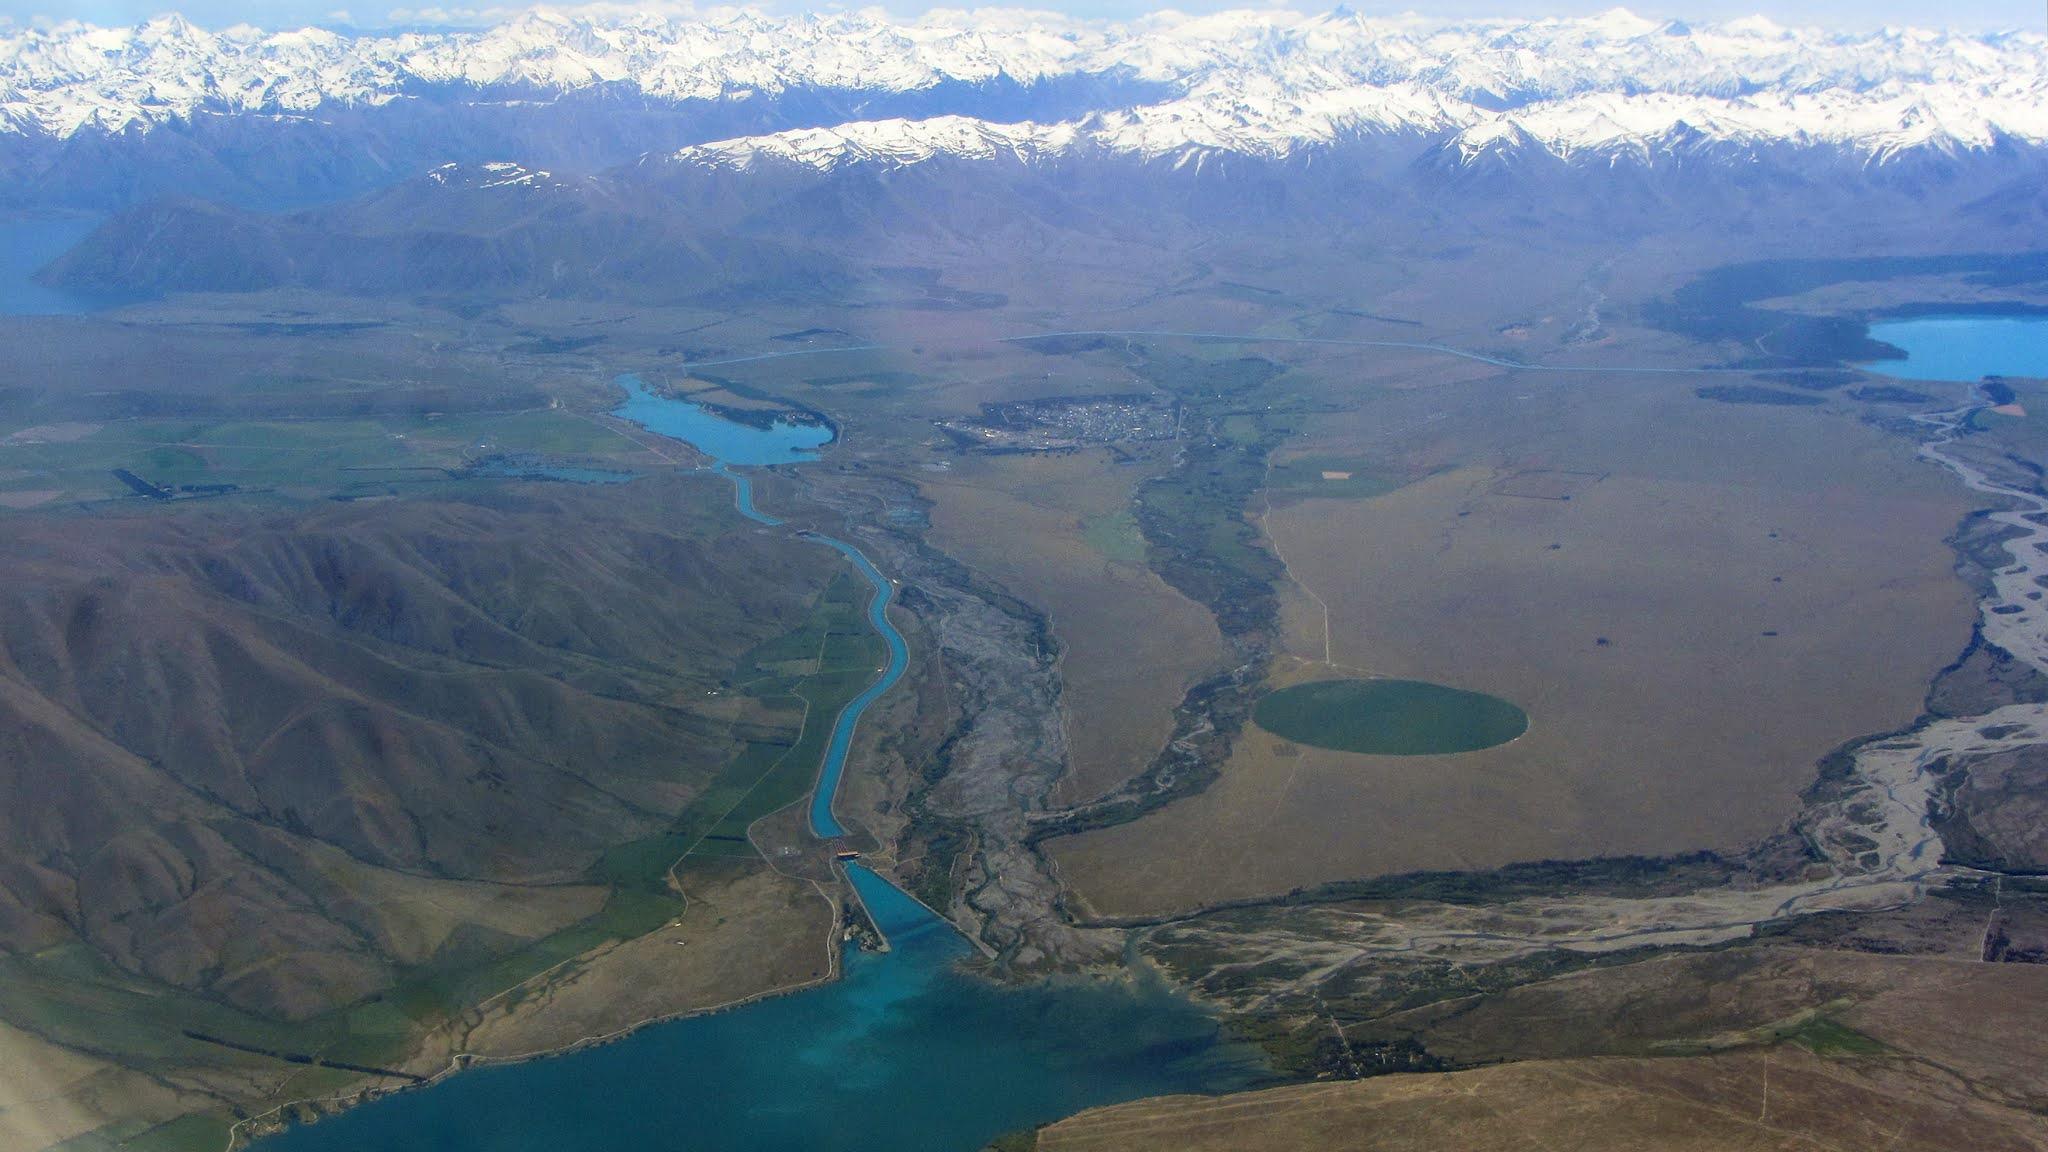 Lake Ruataniwha New Zealand